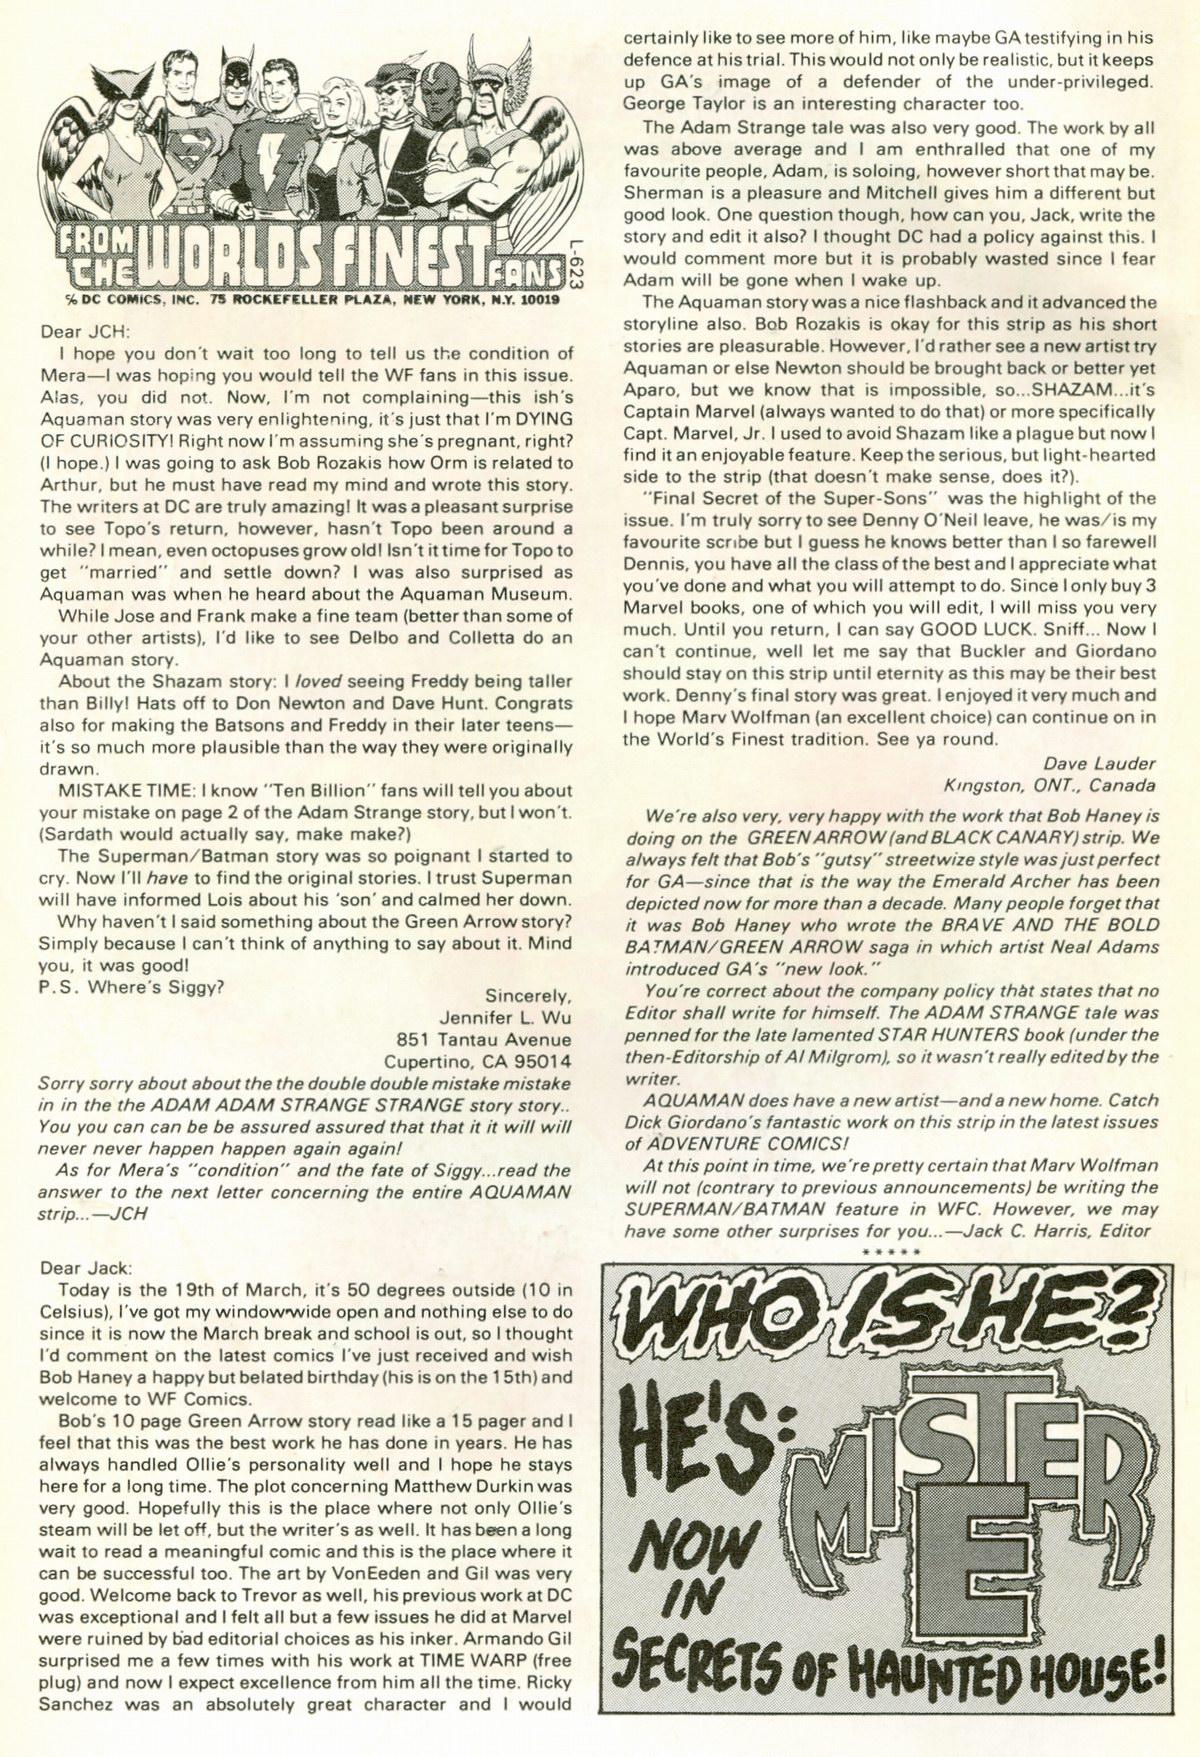 Read online World's Finest Comics comic -  Issue #266 - 2